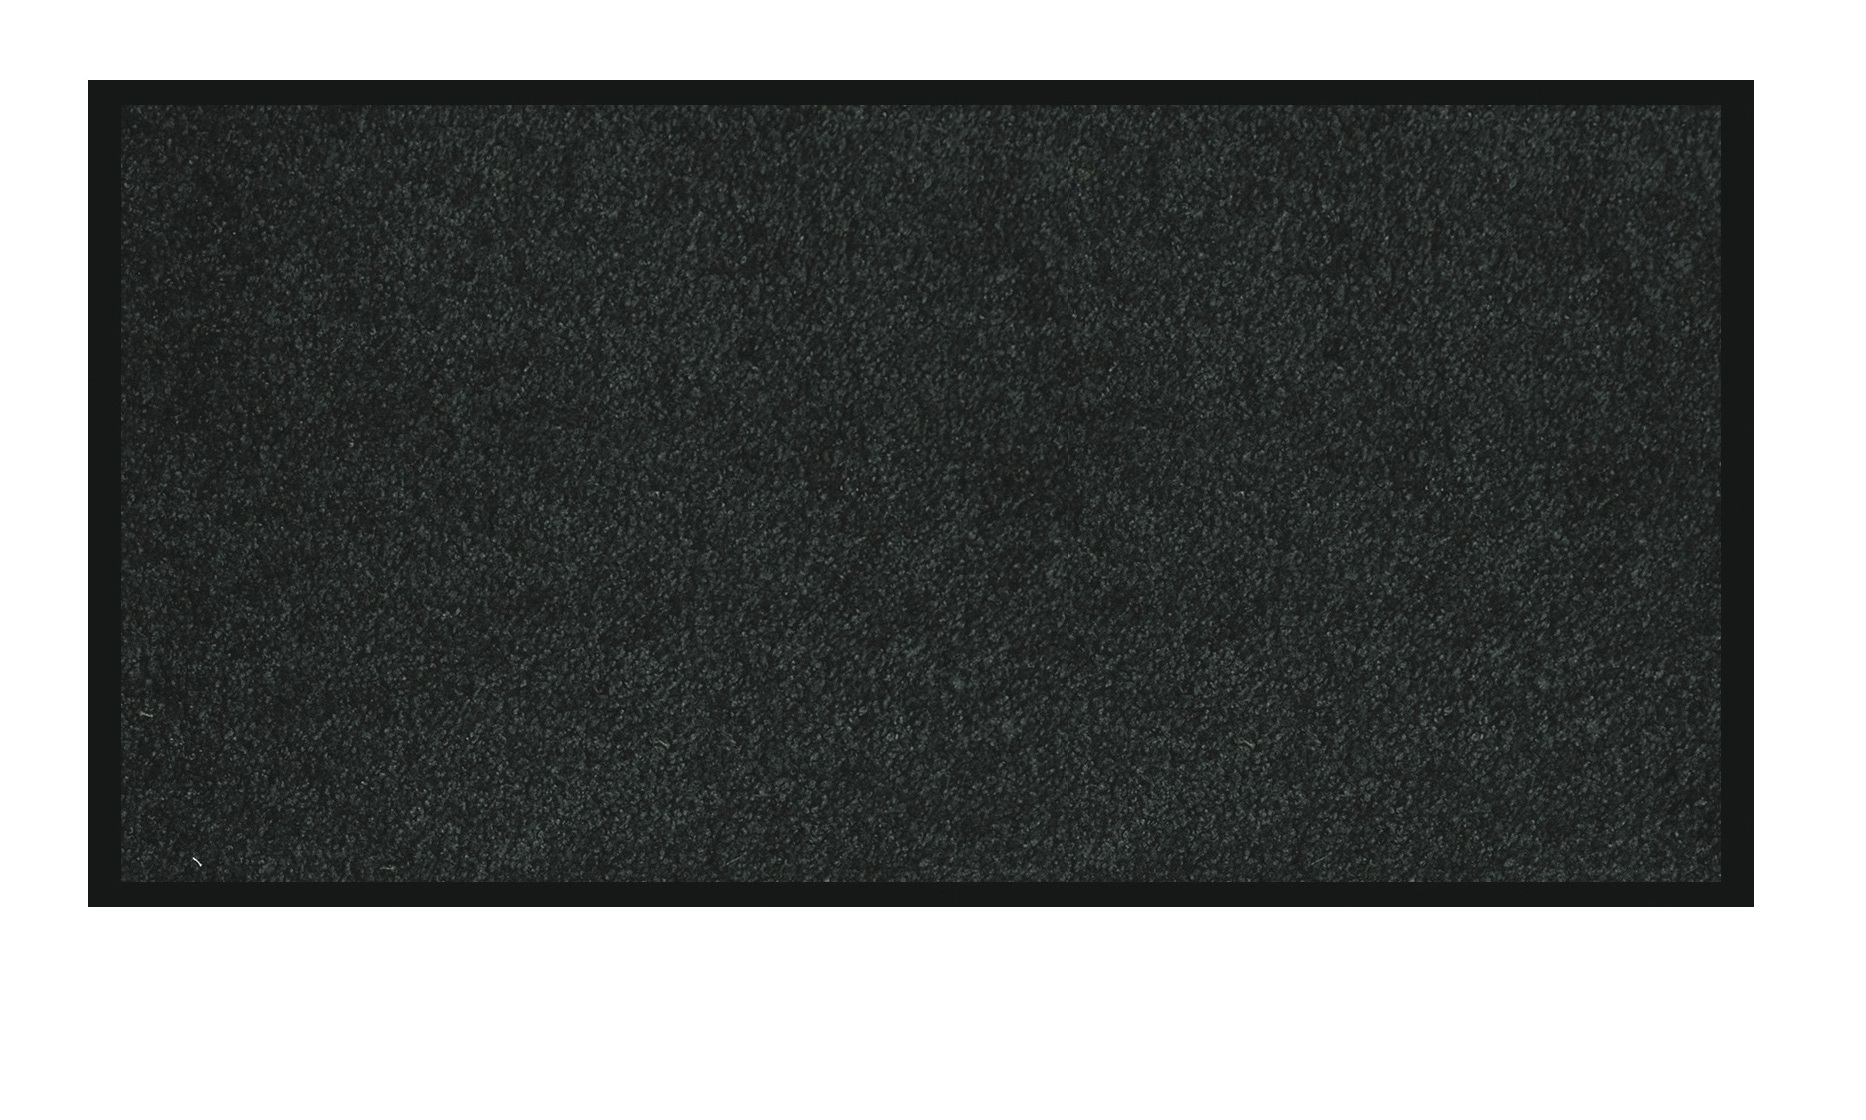 Tapis de sol absorbant RAINBOW - 90 x 150 cm - en polyamide - noir